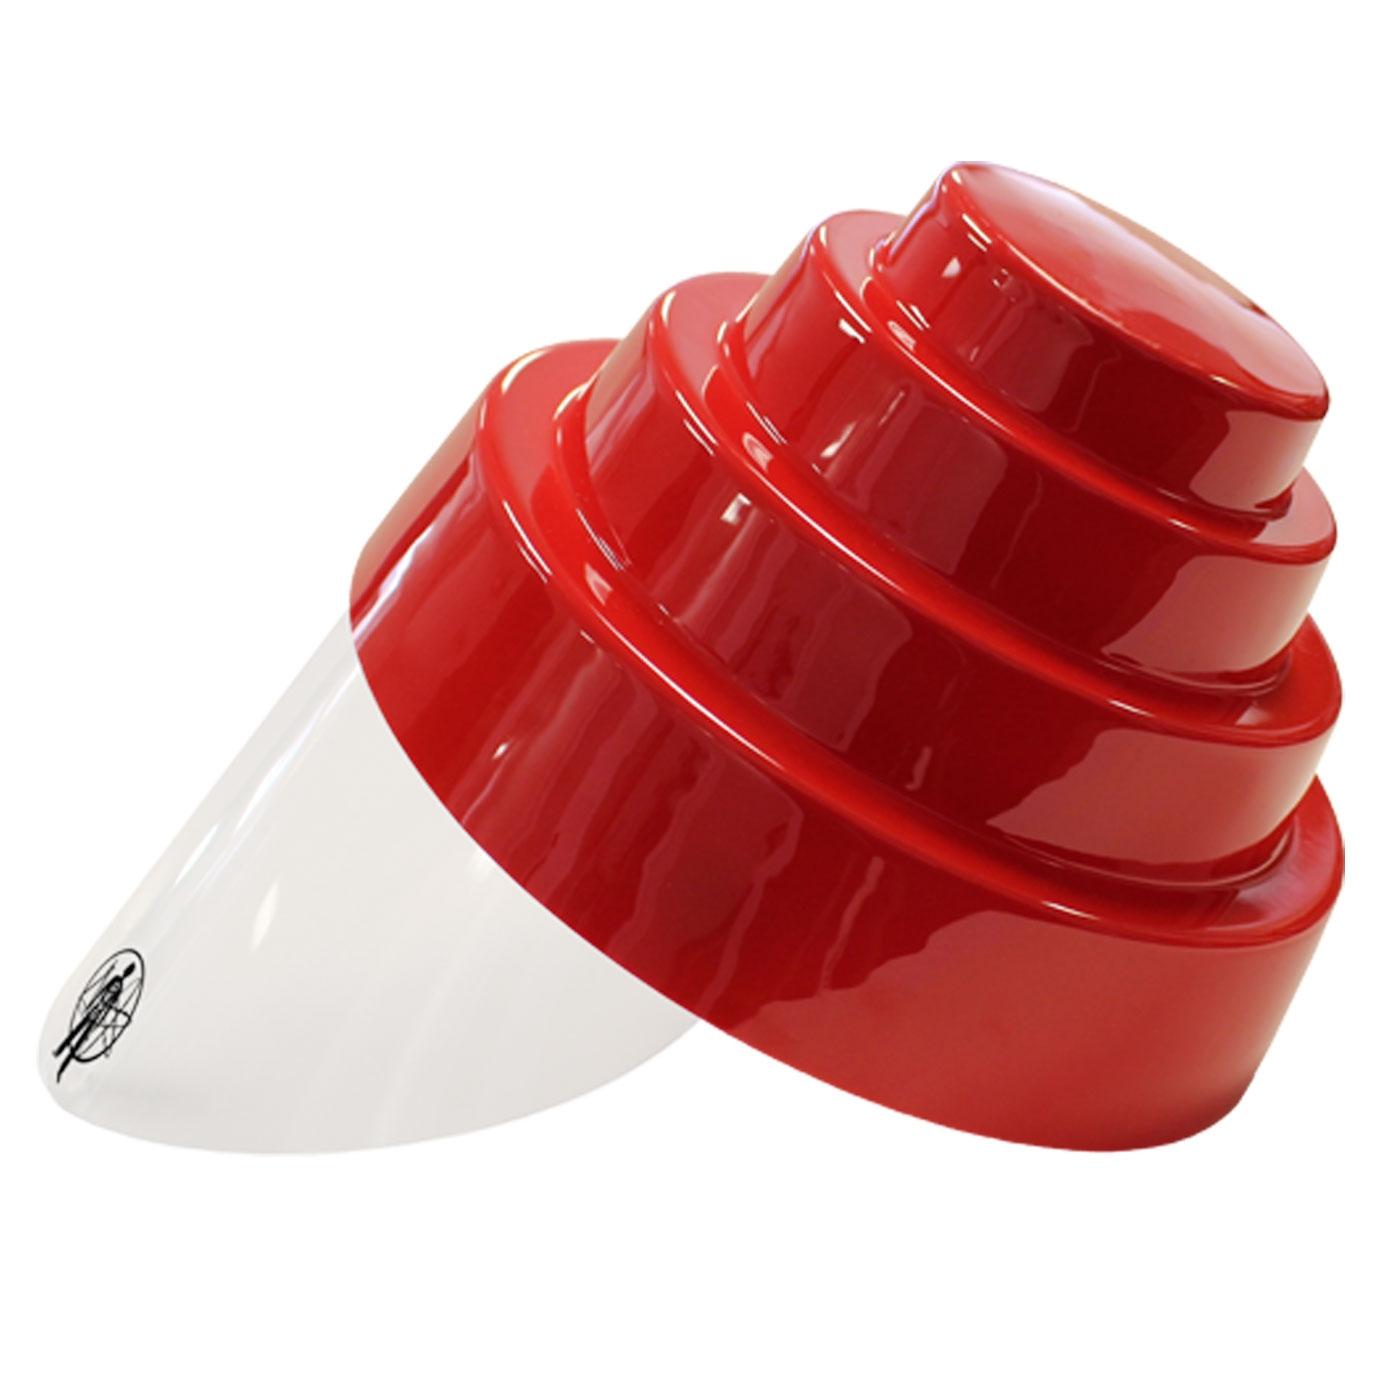 DEVO エナジードーム(フェイスシールド付き) Energy Dome PPE Kit